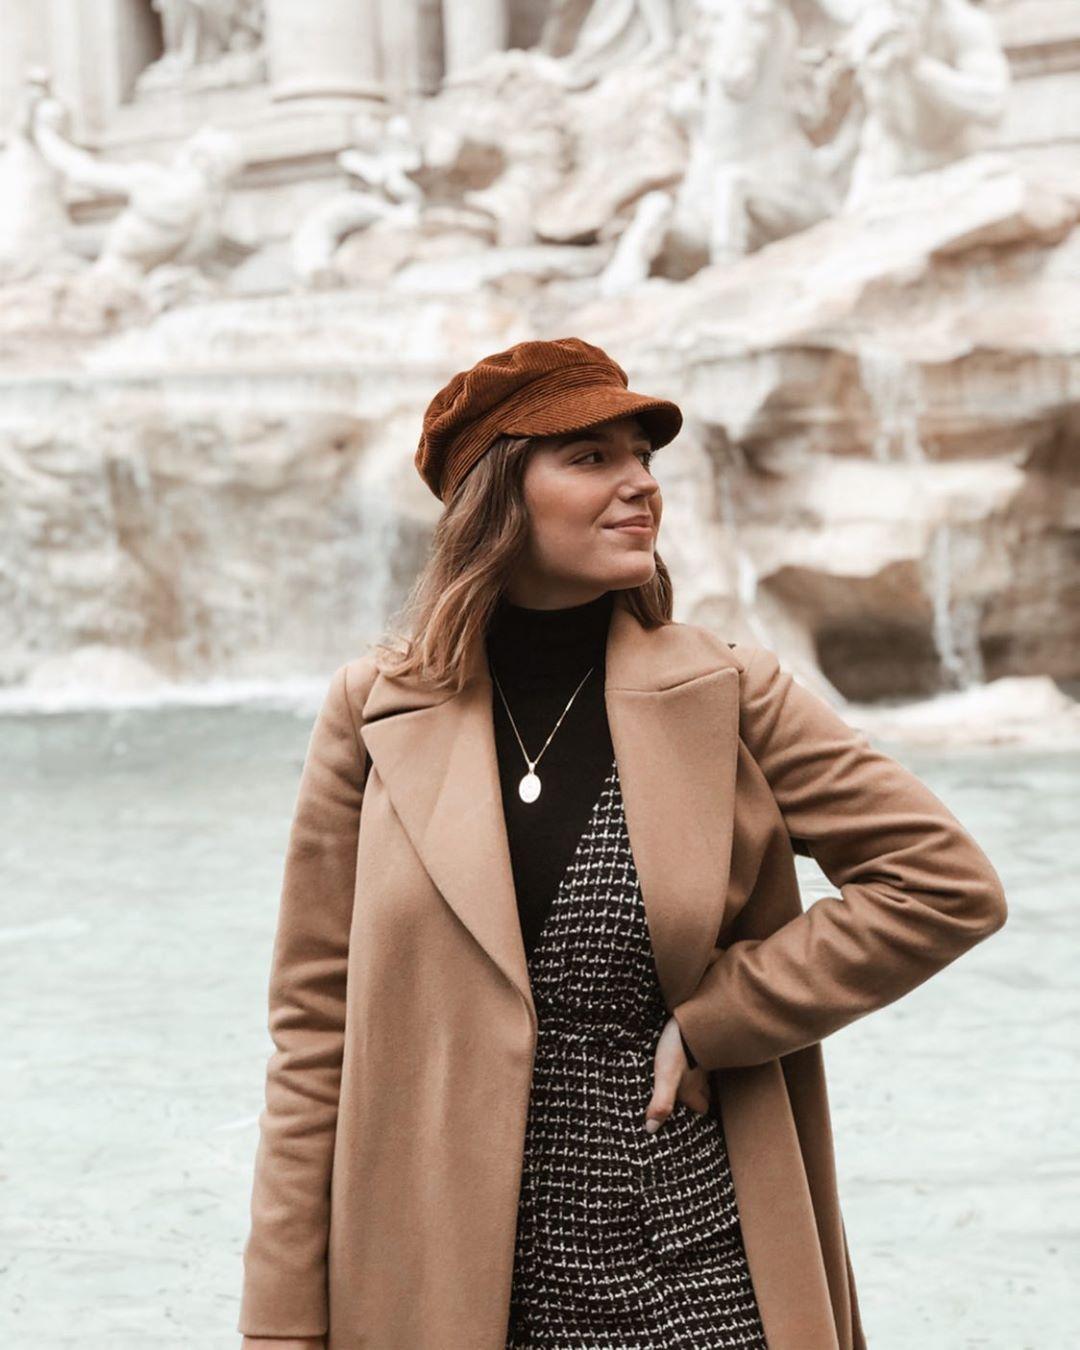 tweed bib overalls dress de Zara sur larascarrasco